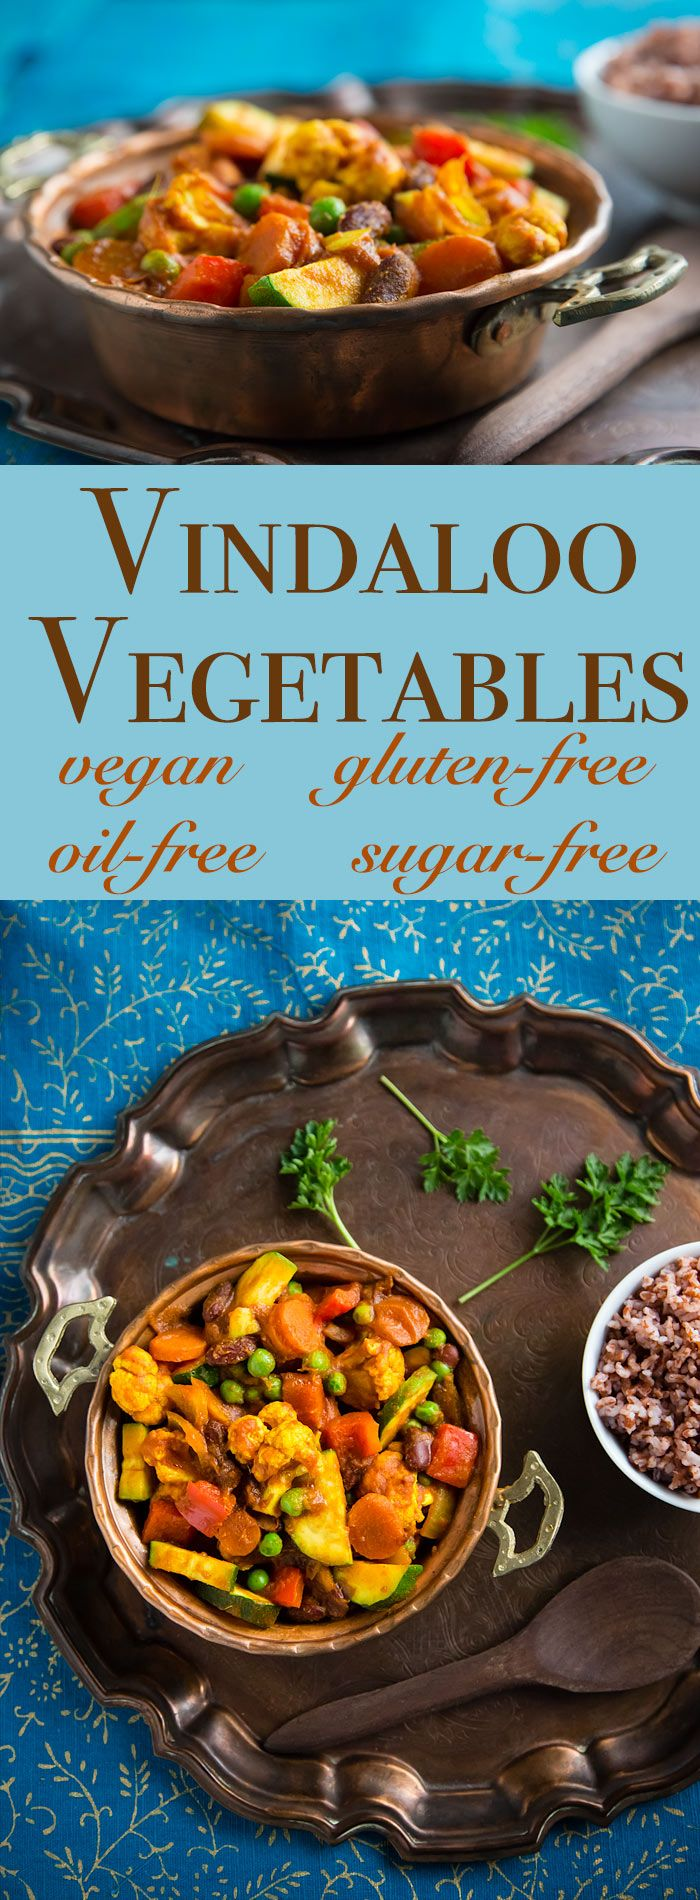 Vindaloo Vegetables Vegan Slow Cooker Vegan Indian